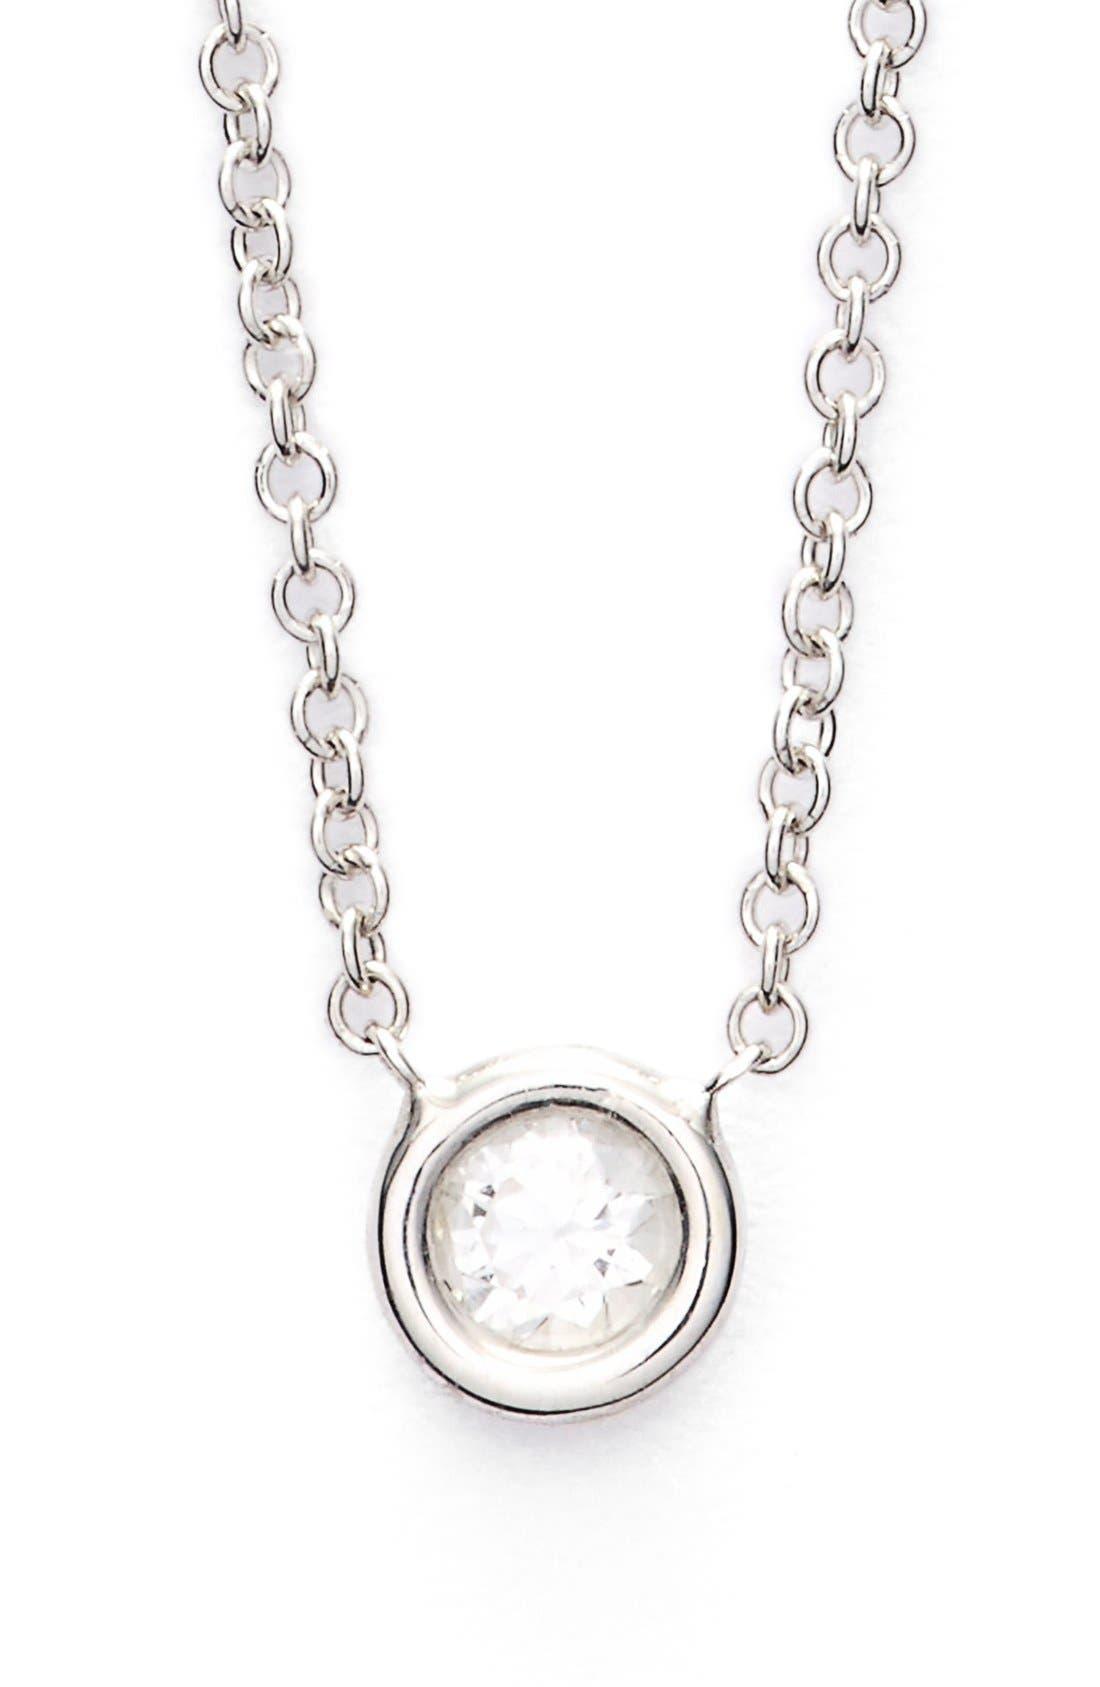 BONY LEVY Small Diamond Solitaire Pendant Necklace